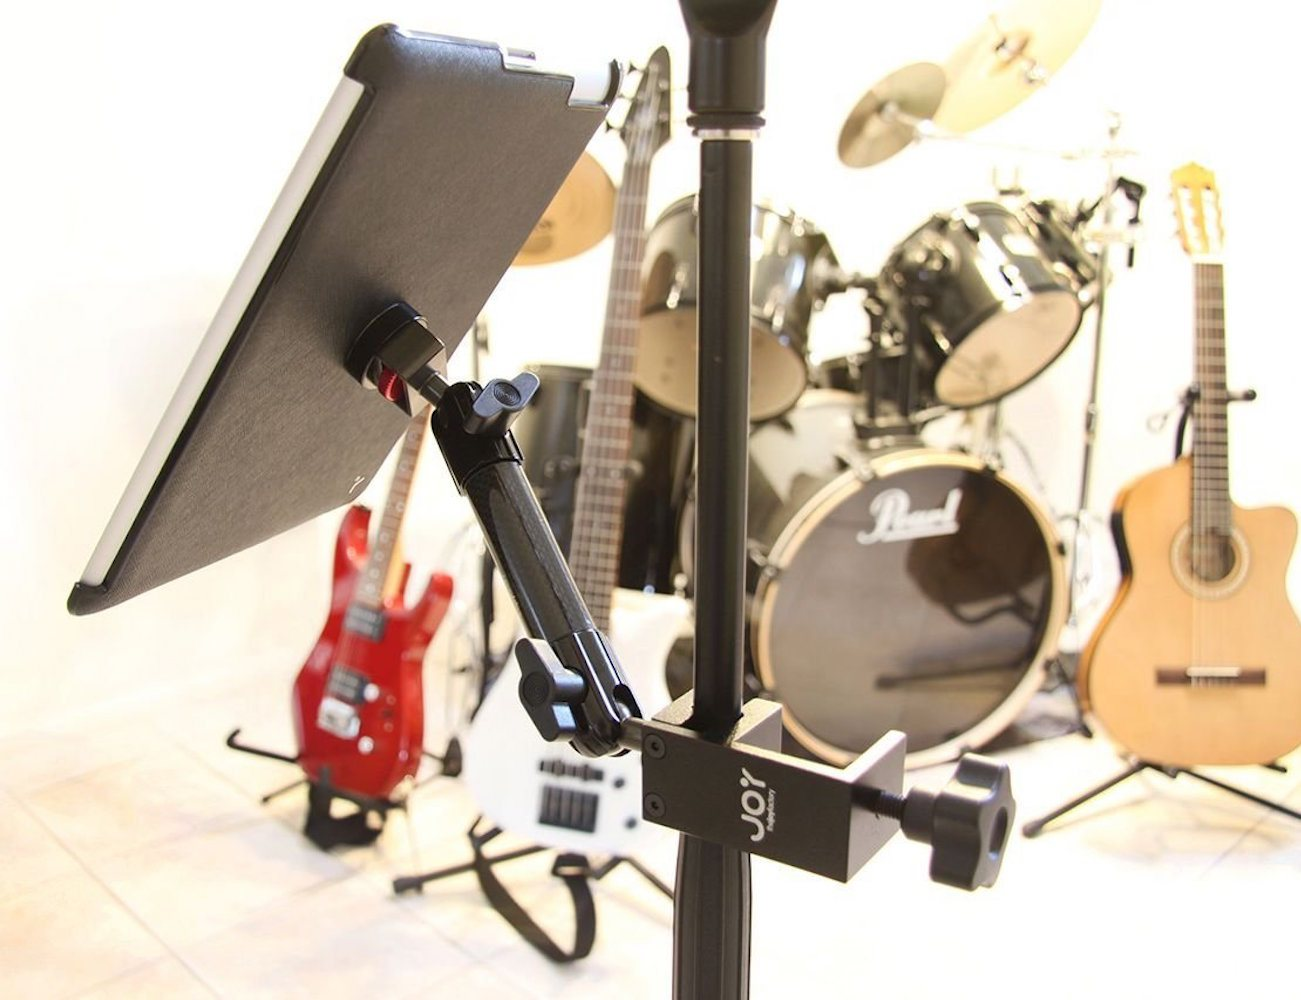 the-joy-factory-tournez-c-clamp-mount-for-ipad-04